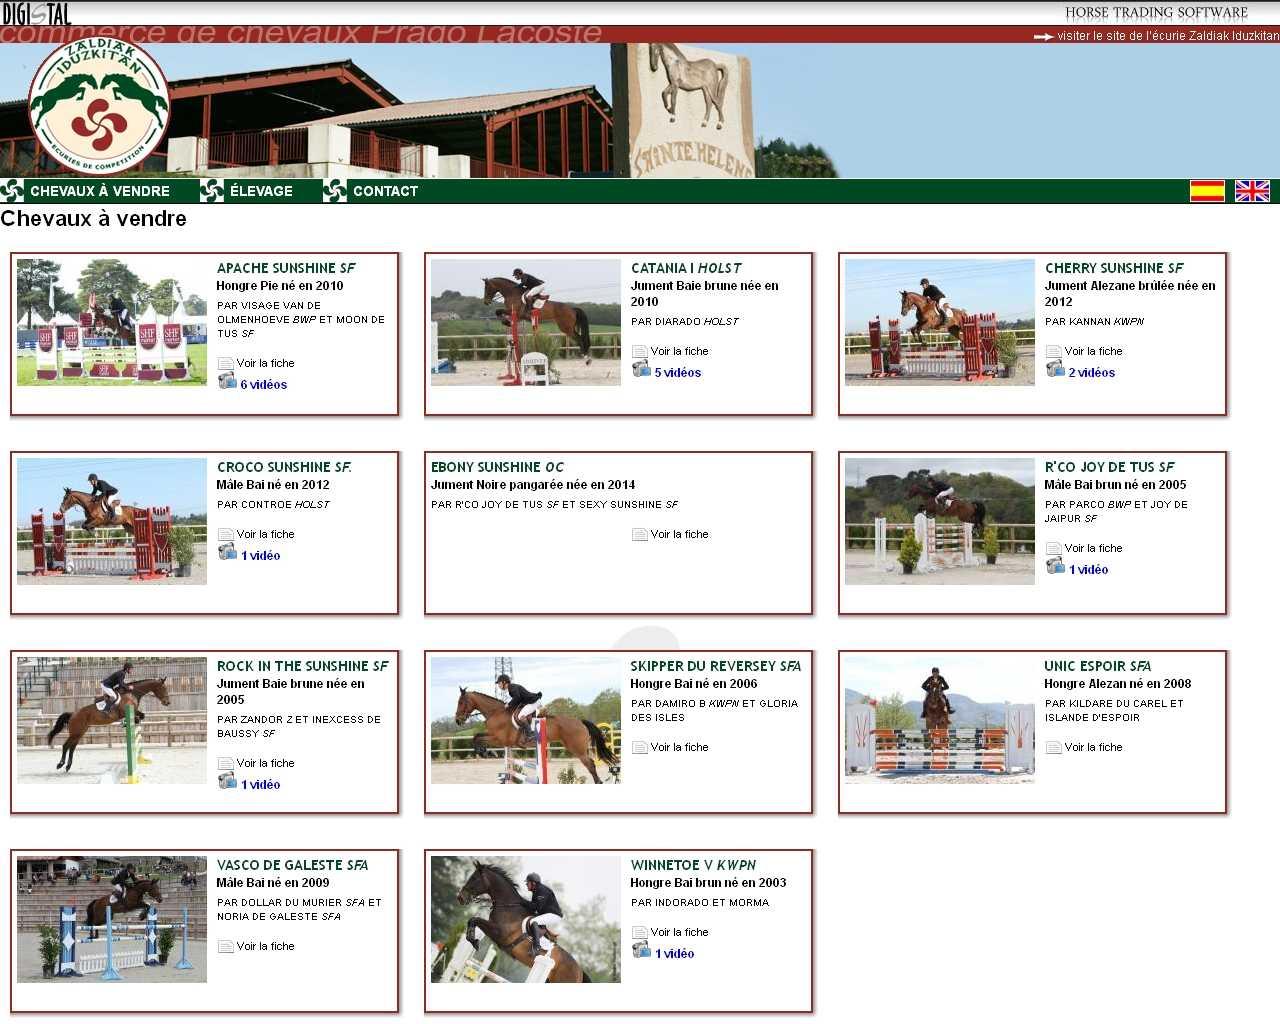 Visuel du site Prado-Lacoste